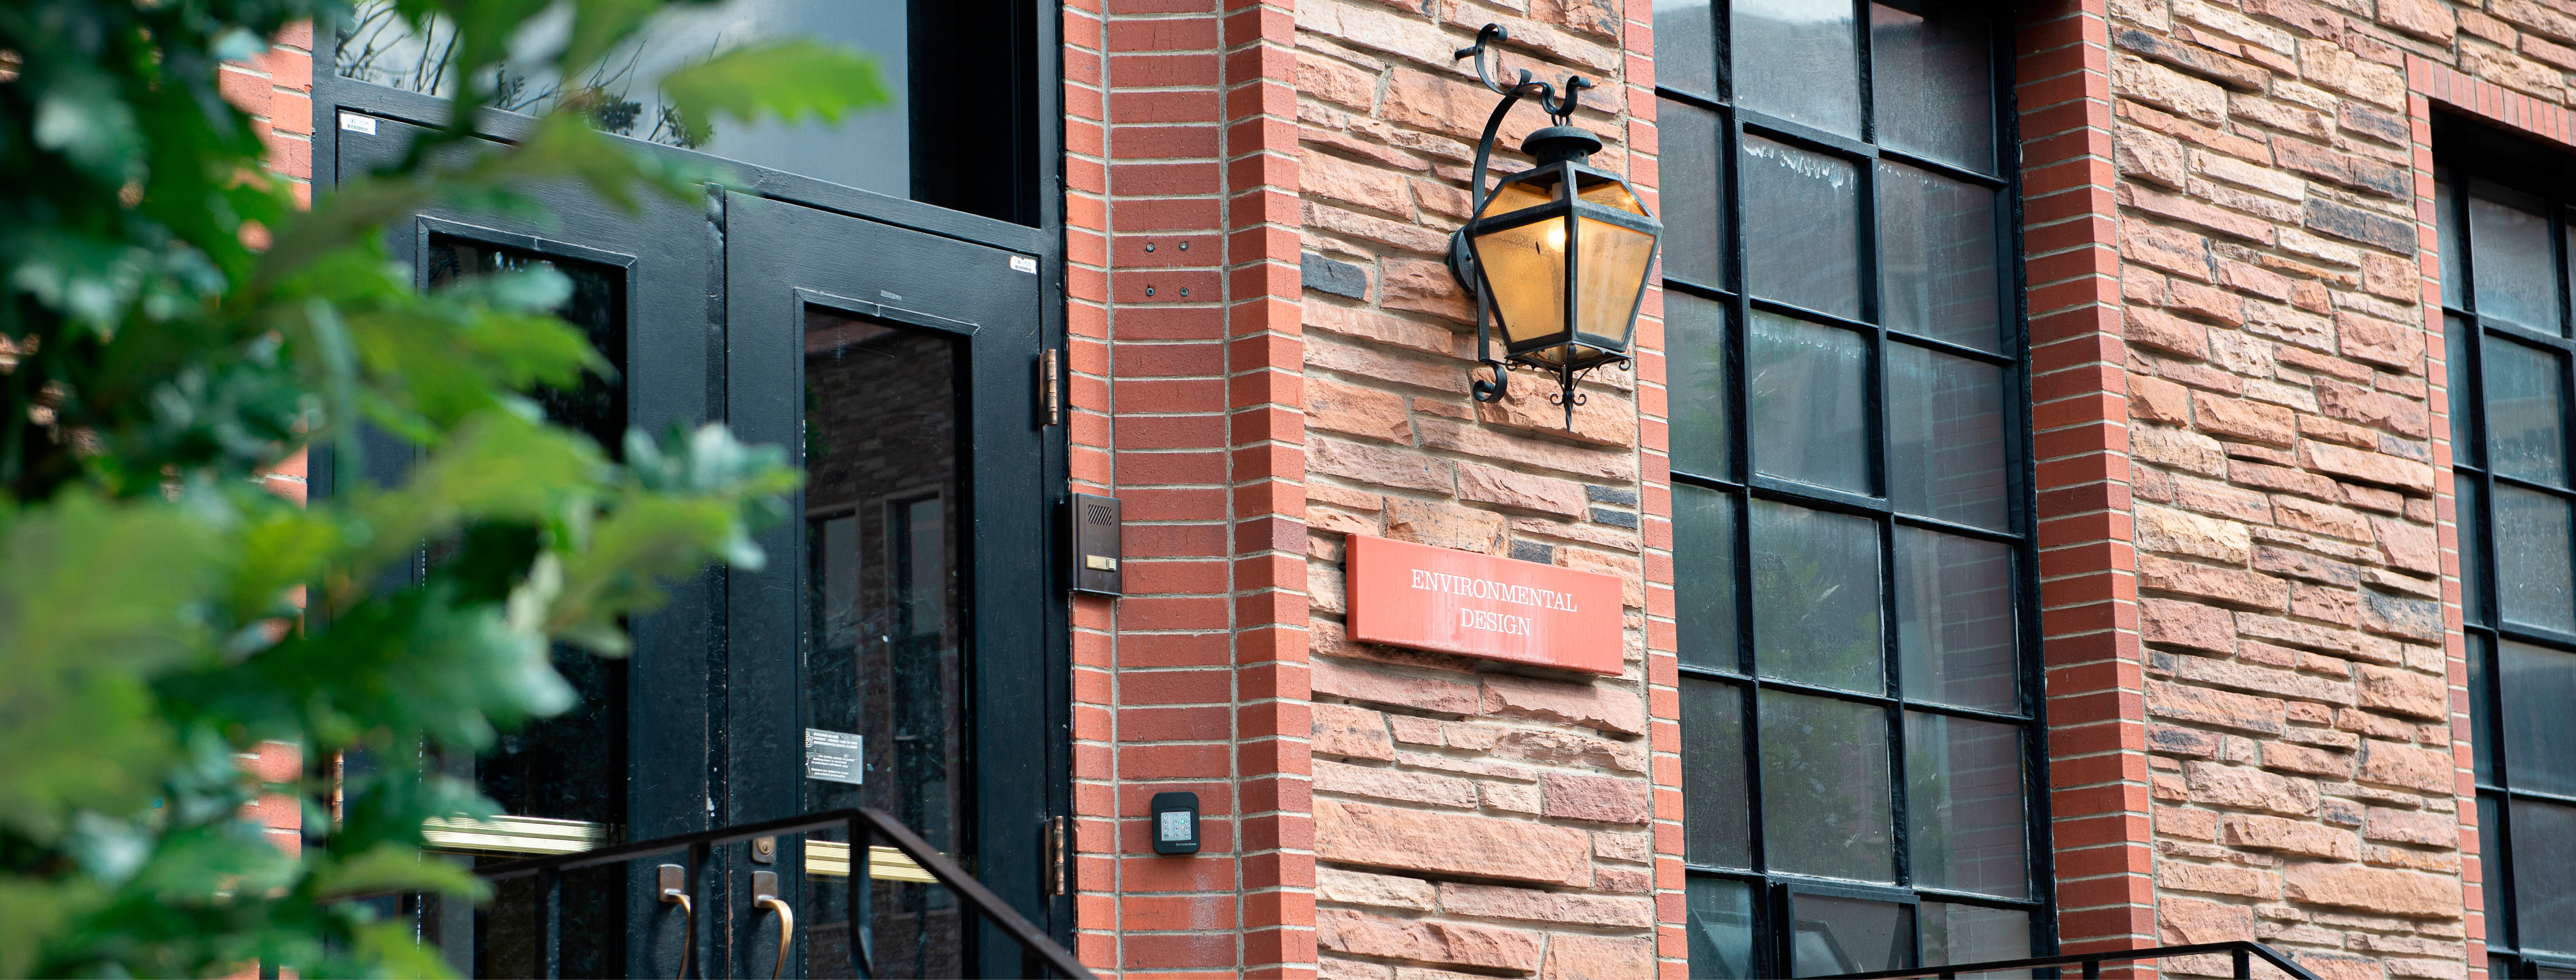 Visit our building on the CU Boulder flagship campus